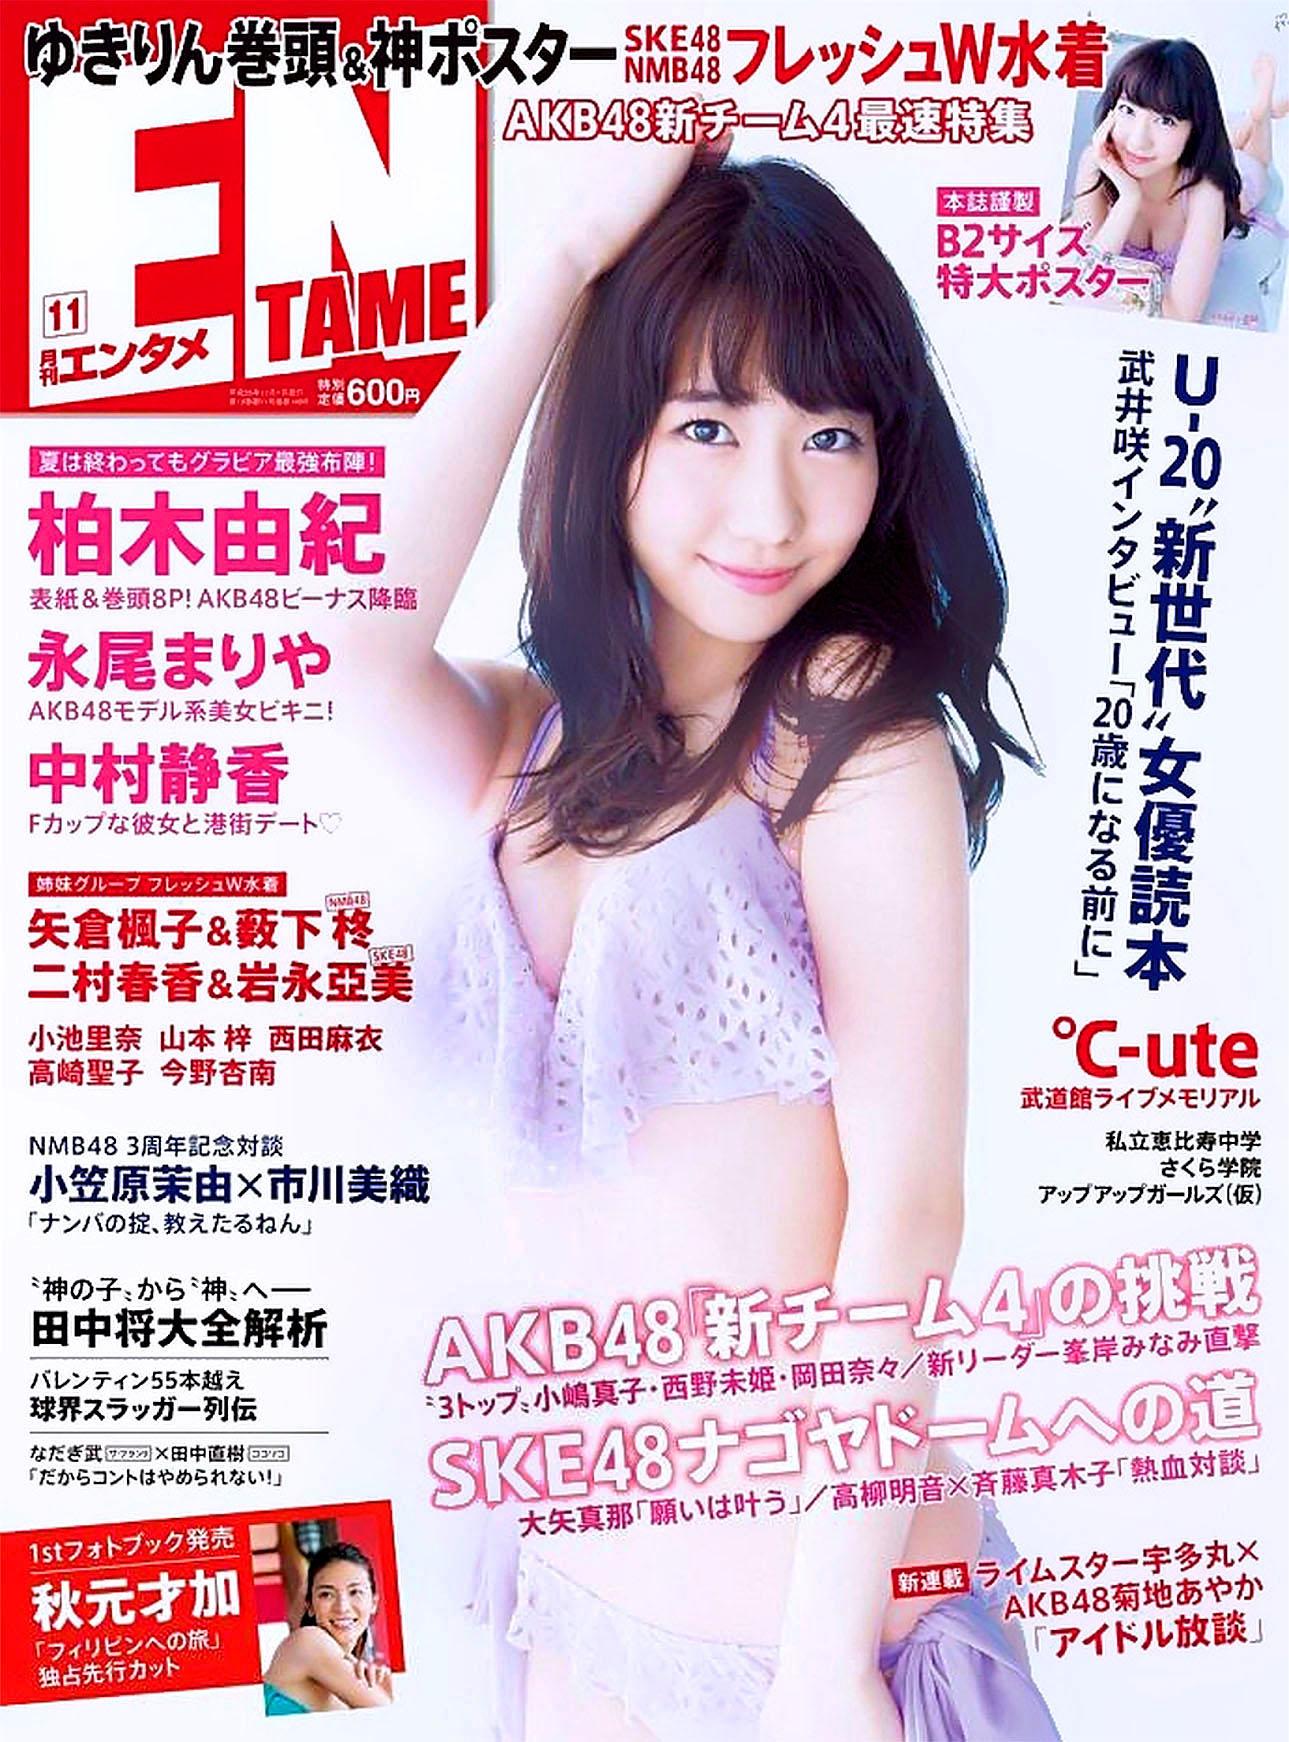 YKashiwagi EnTame 1311 01.jpg